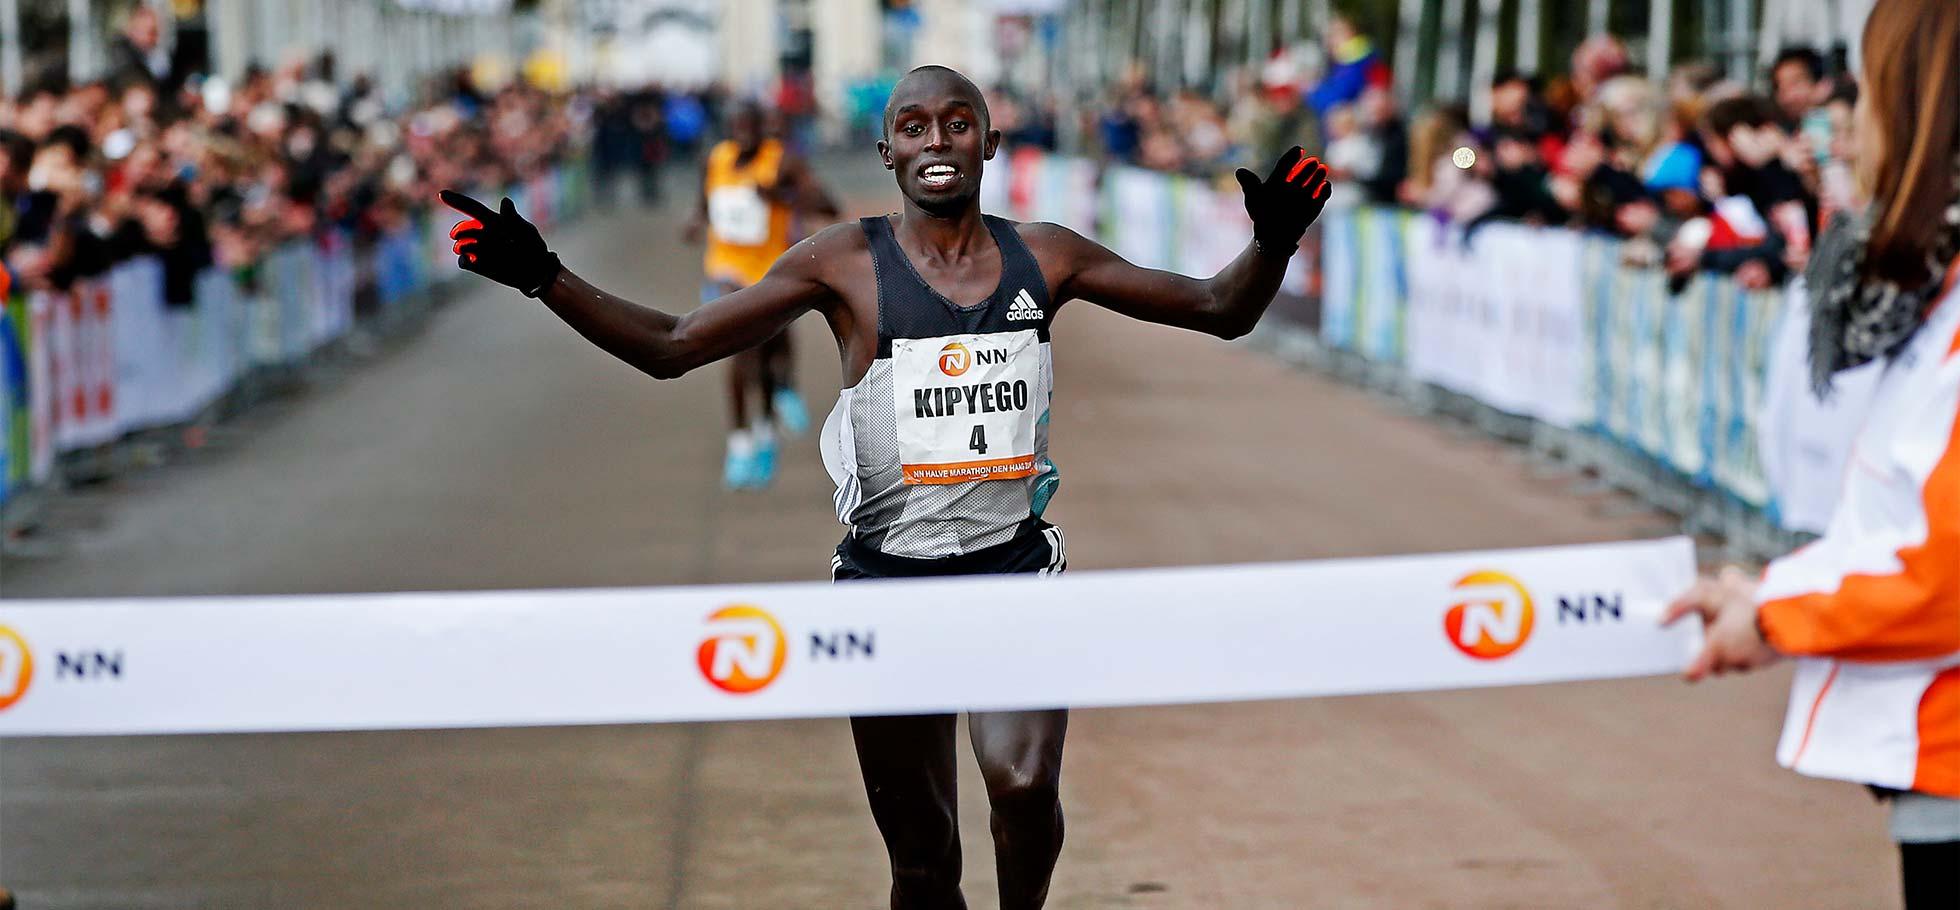 Edwin Kipyego winning Hague Half marathon